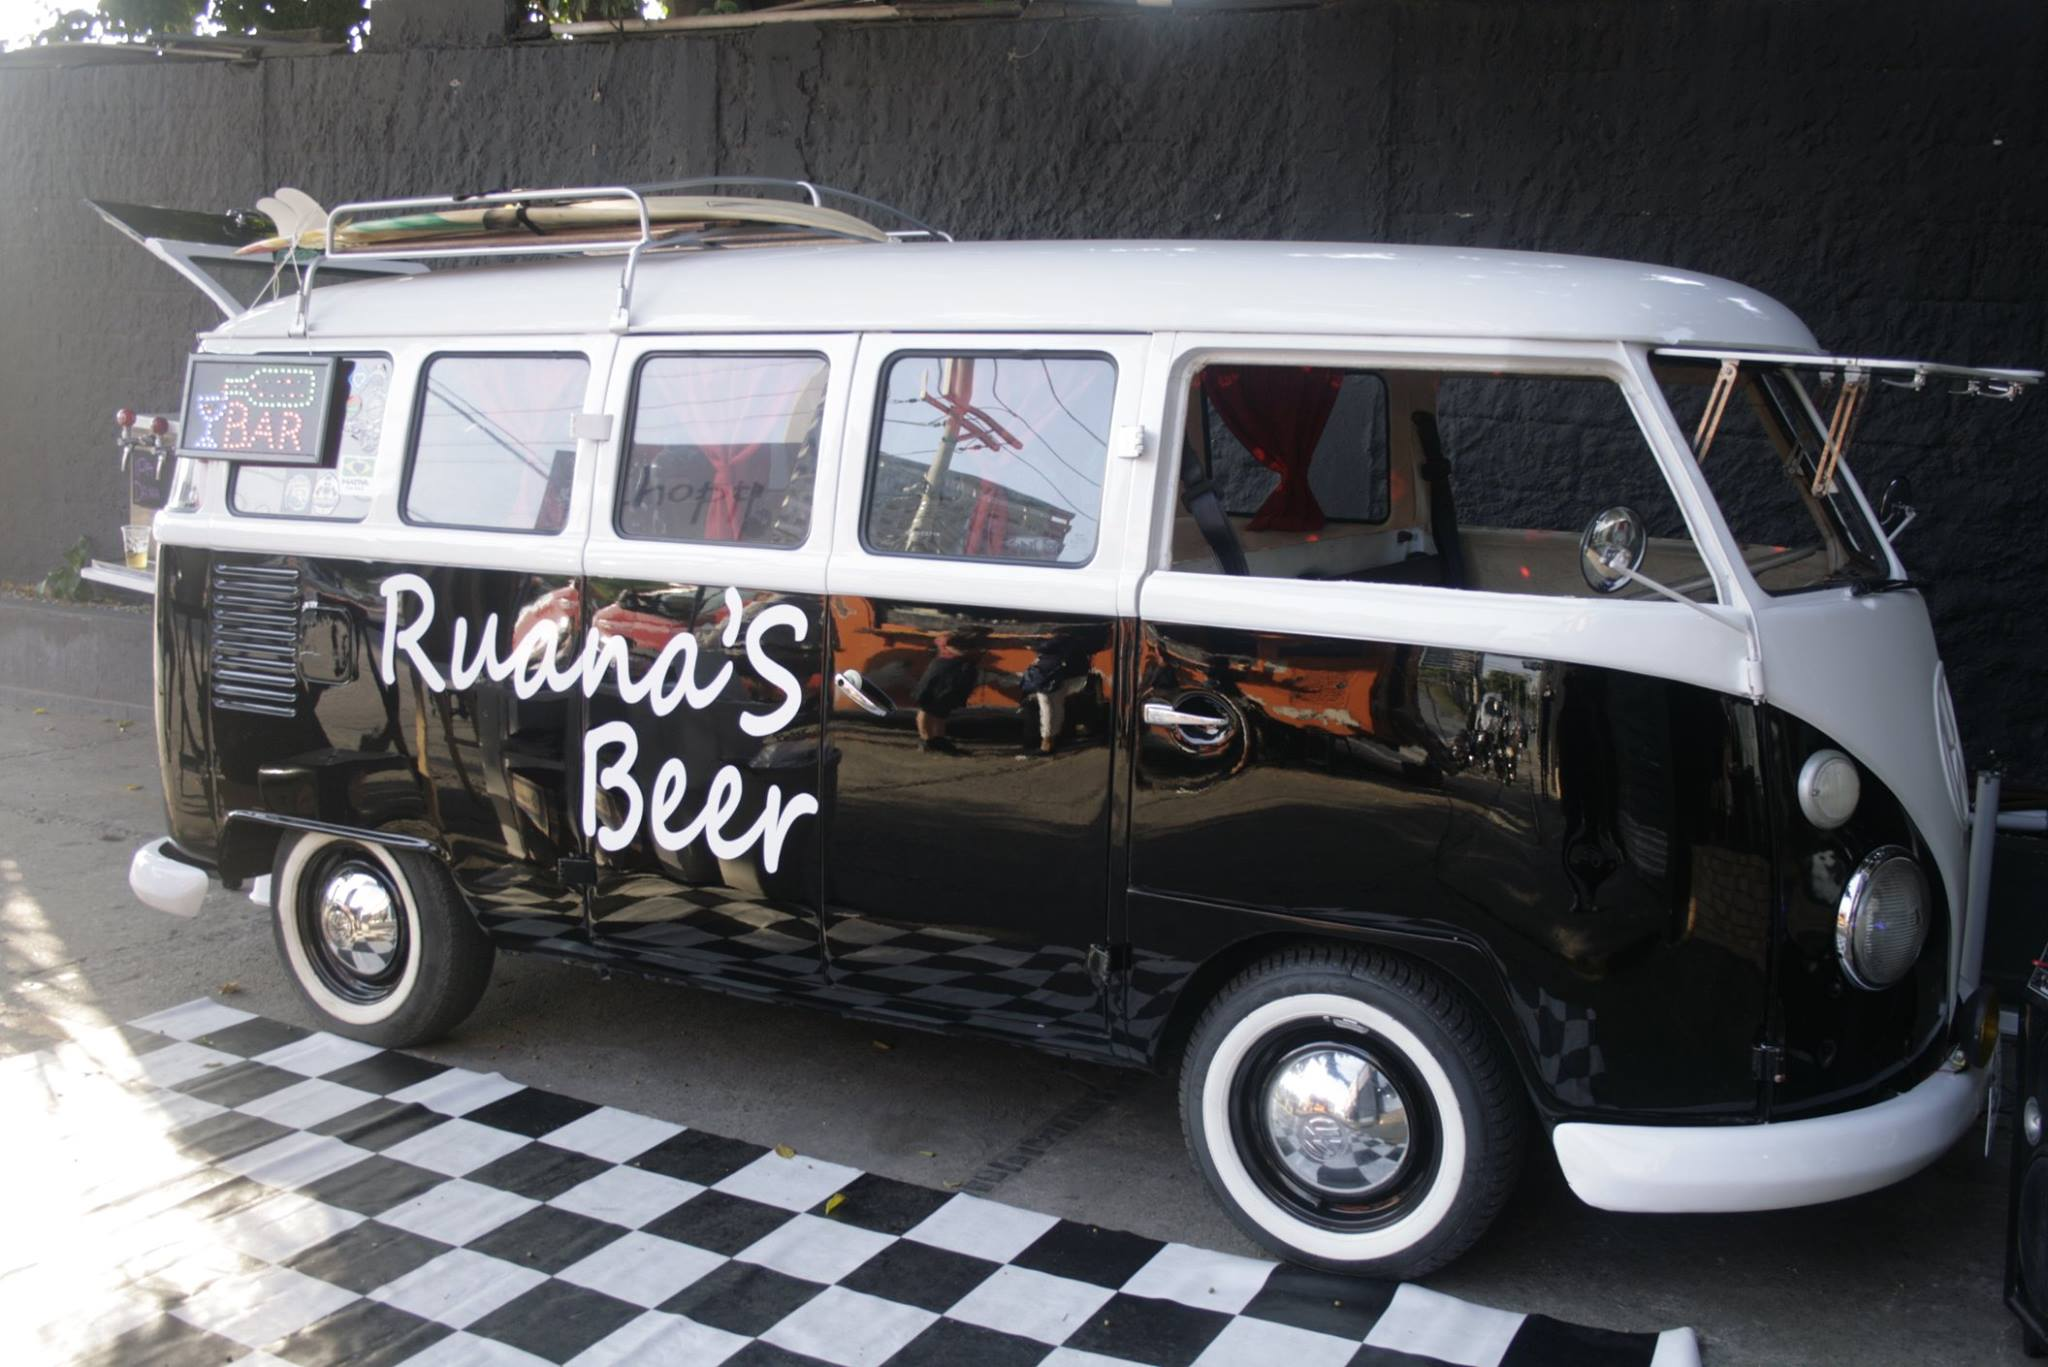 Ruanas-Beer